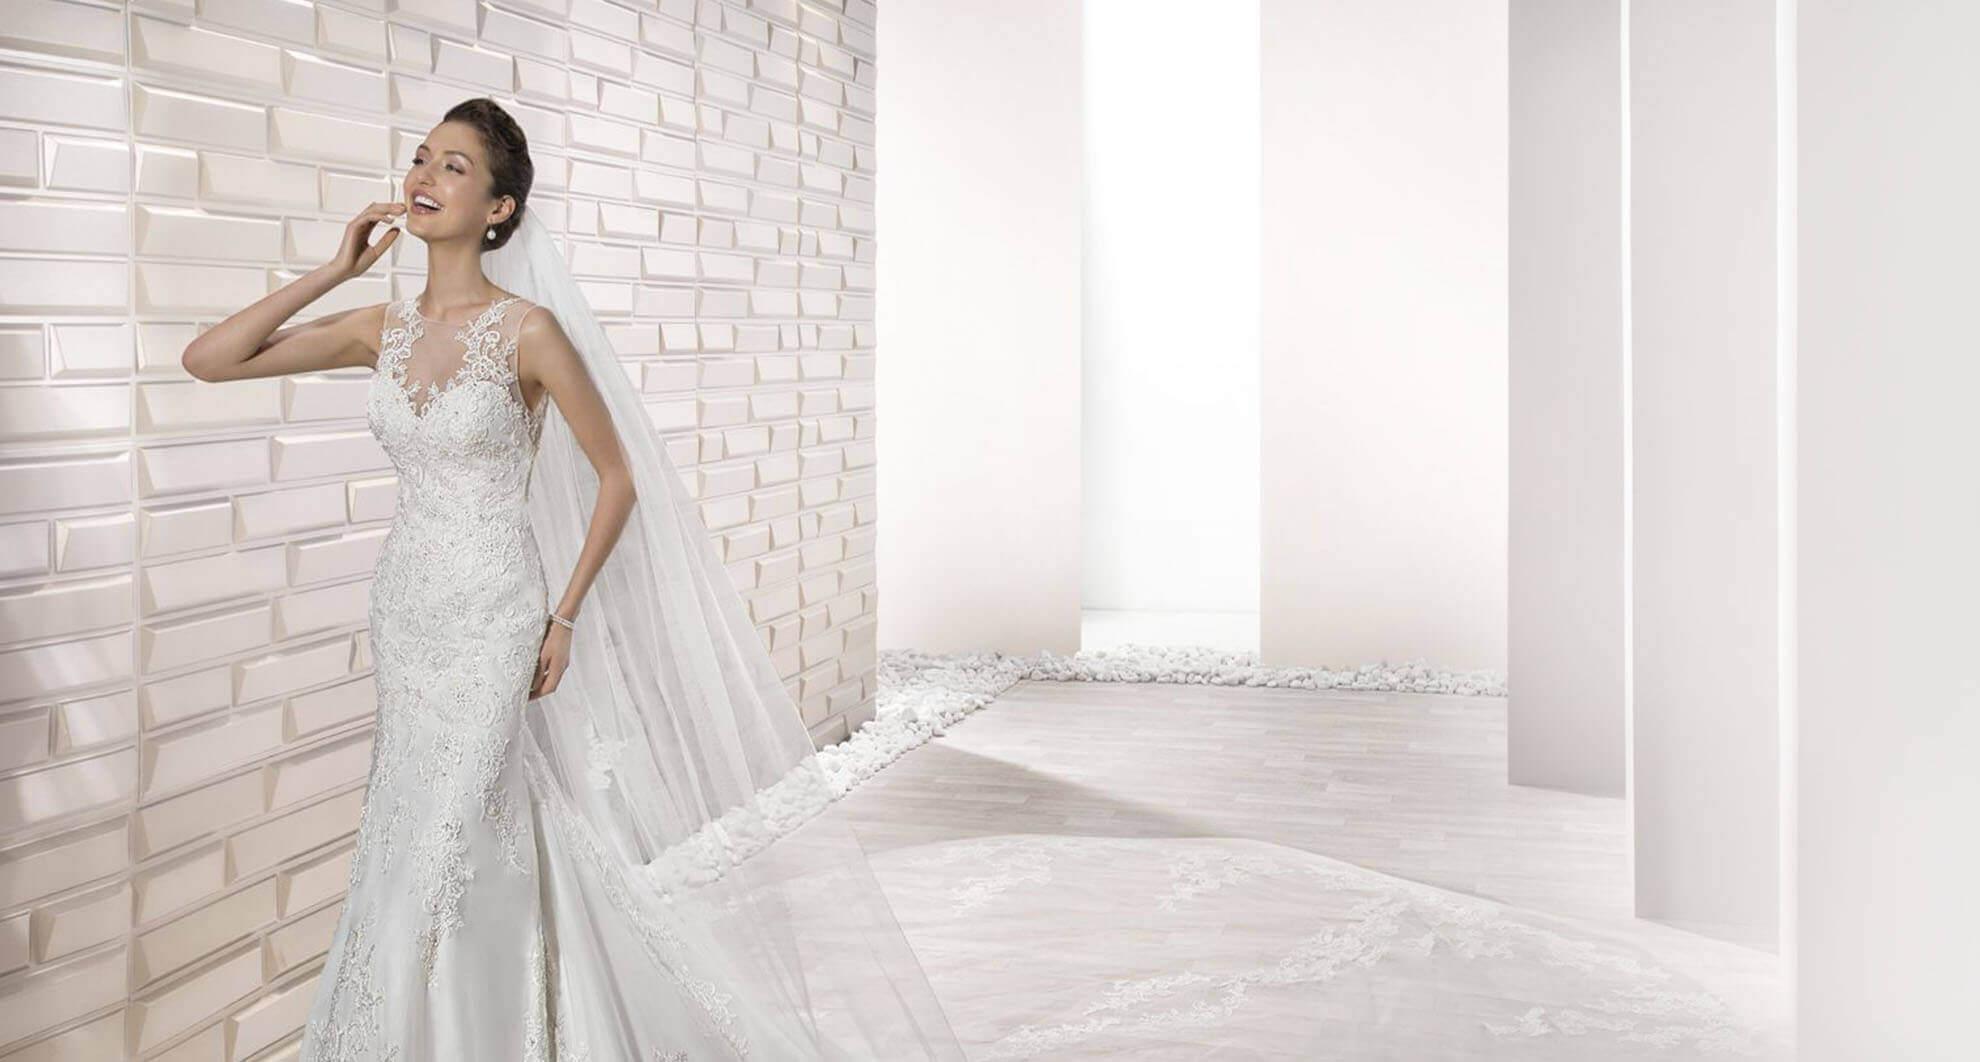 Korte Bruidsjurken 2019.Aphrodite Bruidsmode Unieke Bruidsjurken Trouwpakken